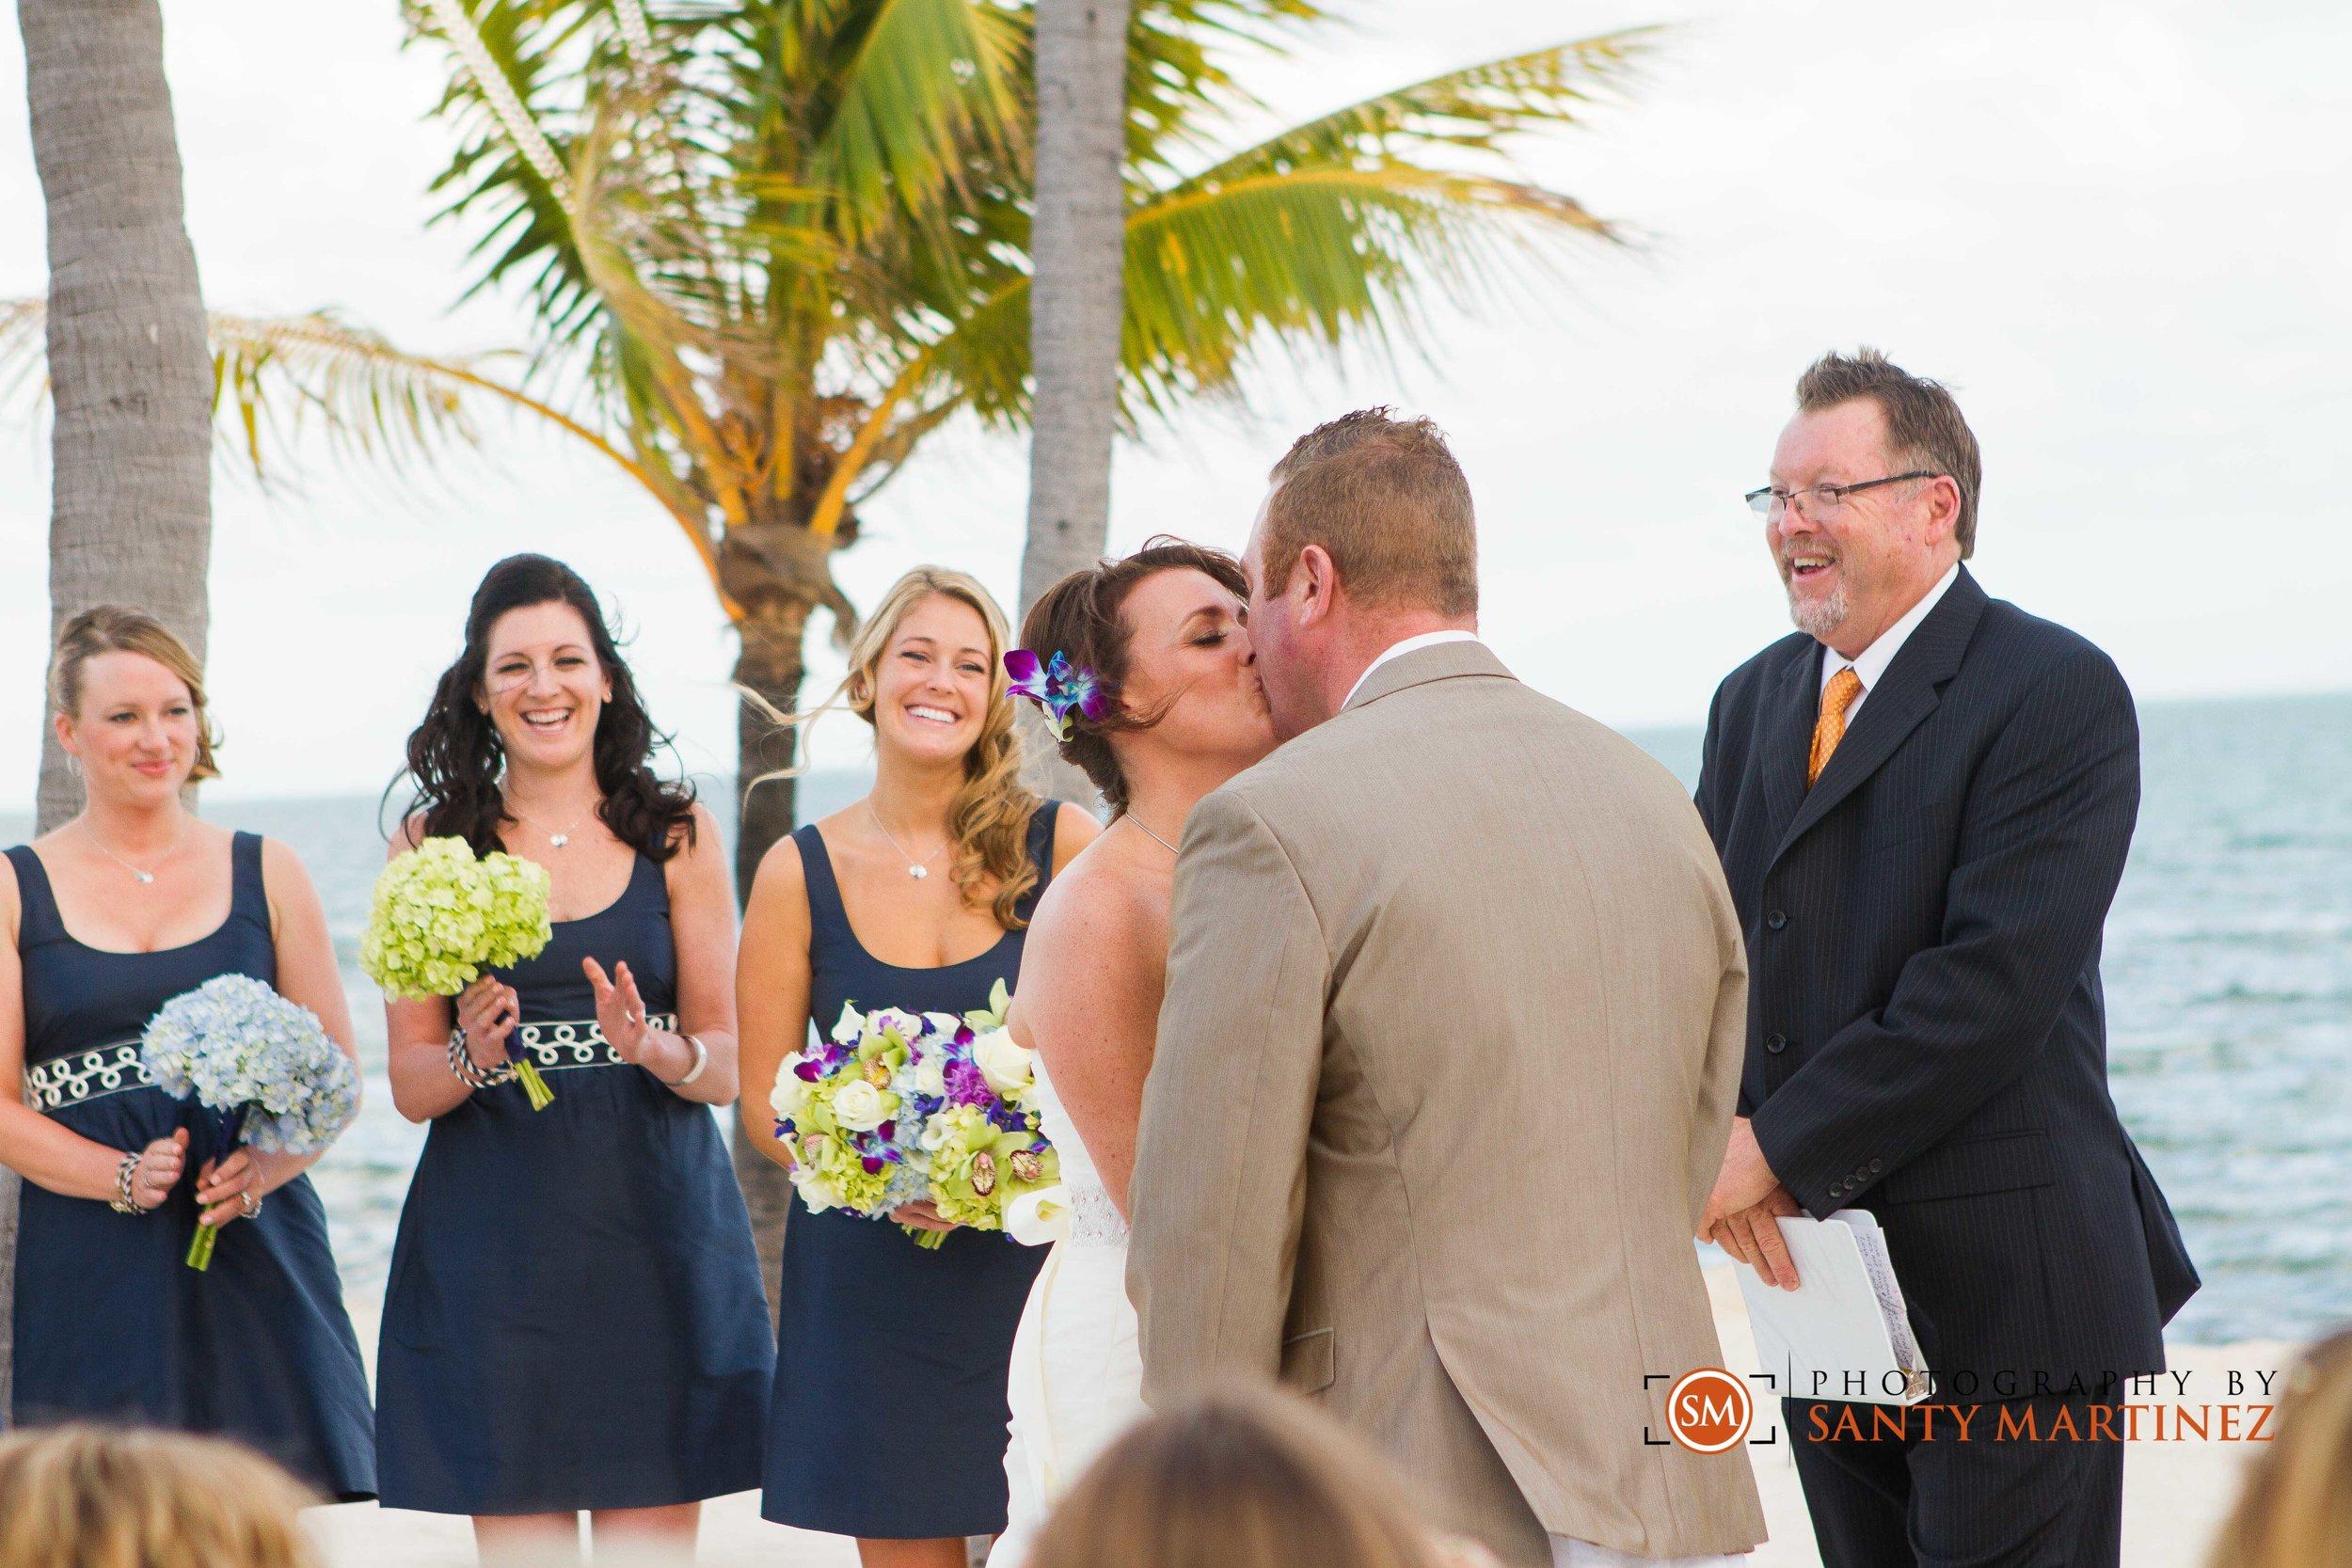 Photography by Santy Martinez - Miami Wedding Photographer-040.jpg